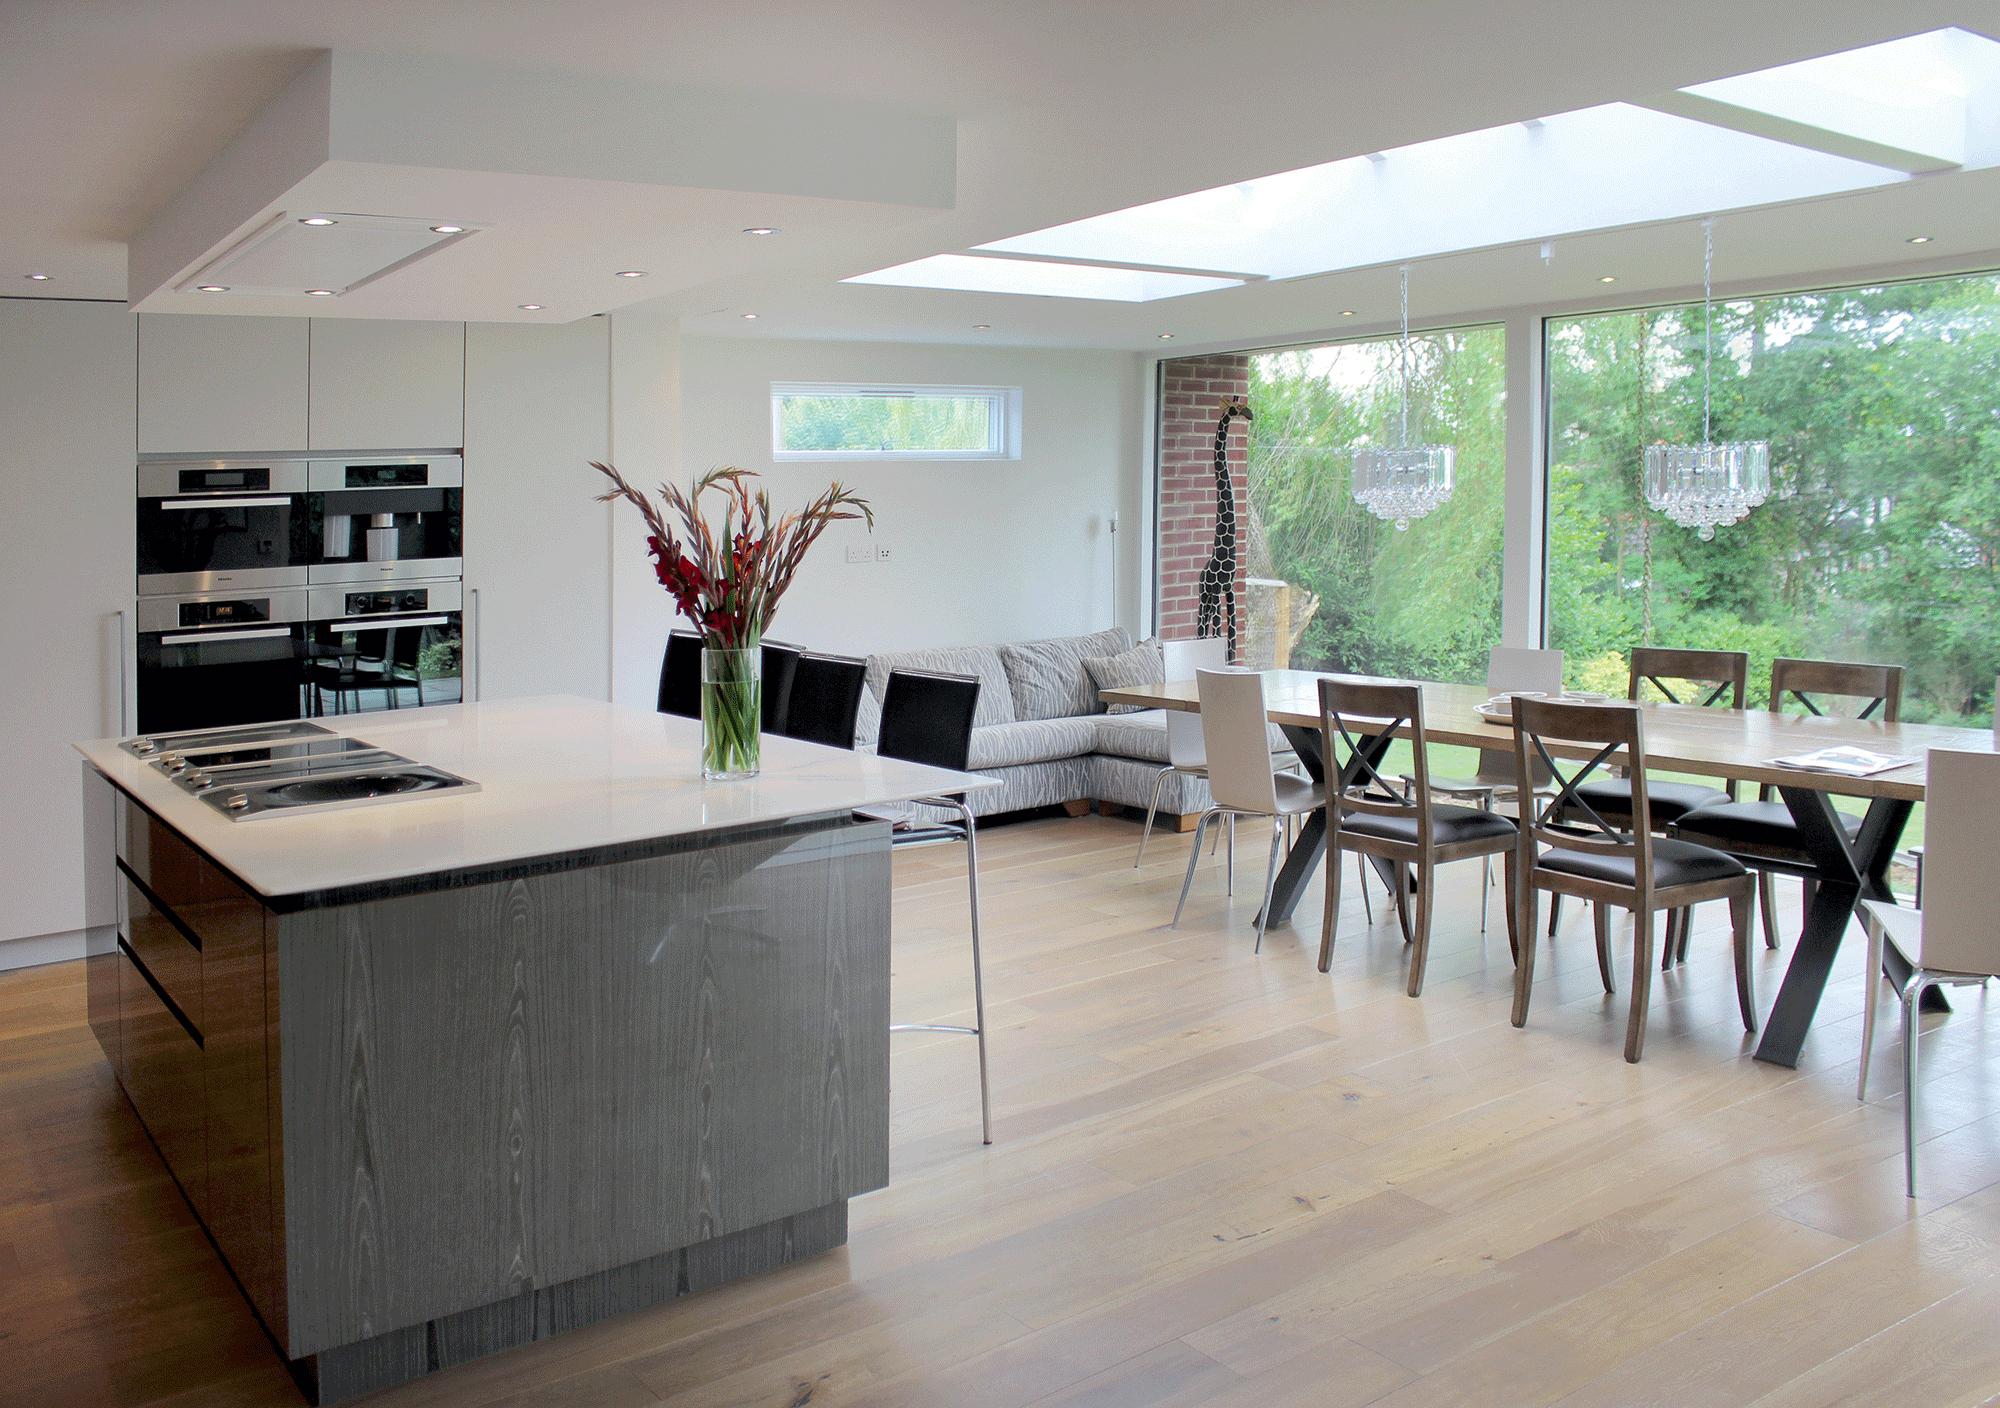 Kitchen Dining Room Extension Design Ideas   Novocom.top